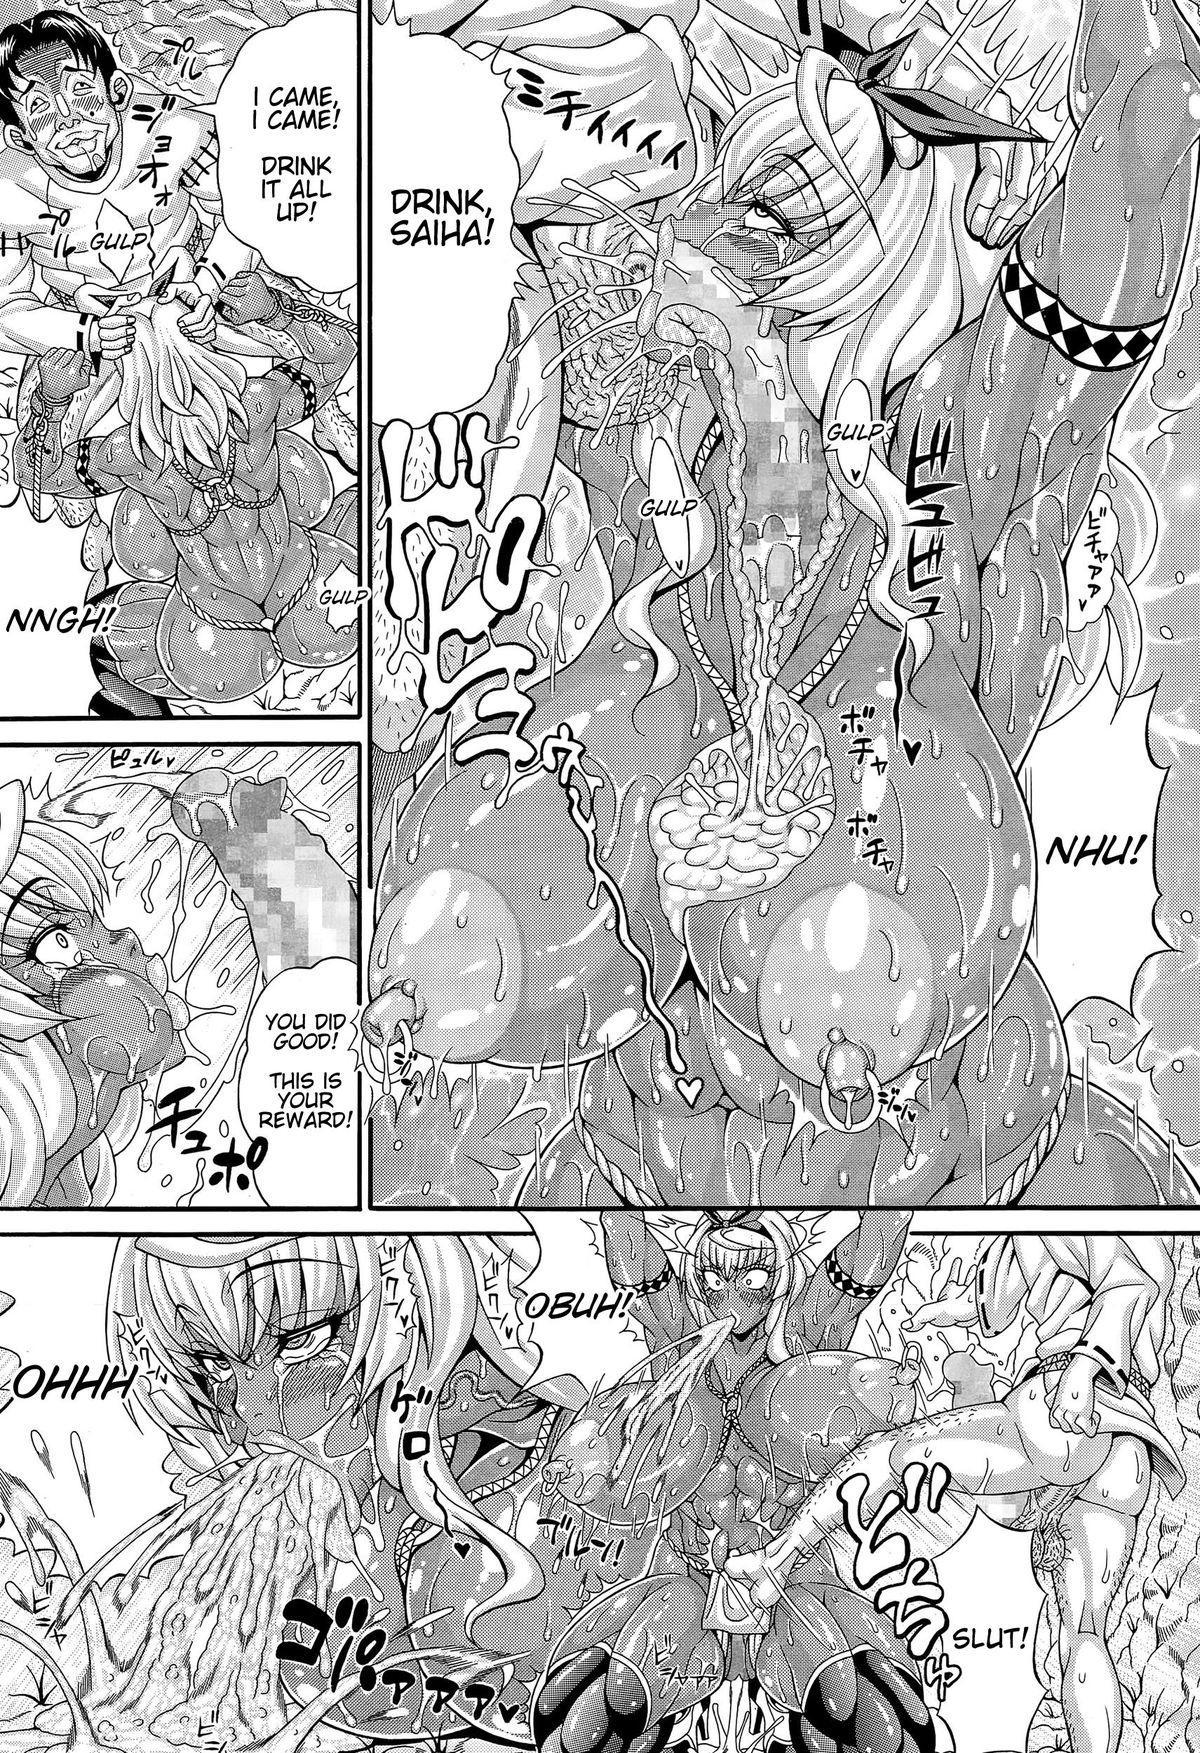 [Andou Hiroyuki] Mahoutsukai Musou ~Sengoku Pakohime Kasshoku Kinniku Onna Hen~   Peerless 30 Year Old Virgin - Warring States Muscled Brown Fuck Princess (COMIC Tenma 2015-06) [English] [Natty Translations] 7